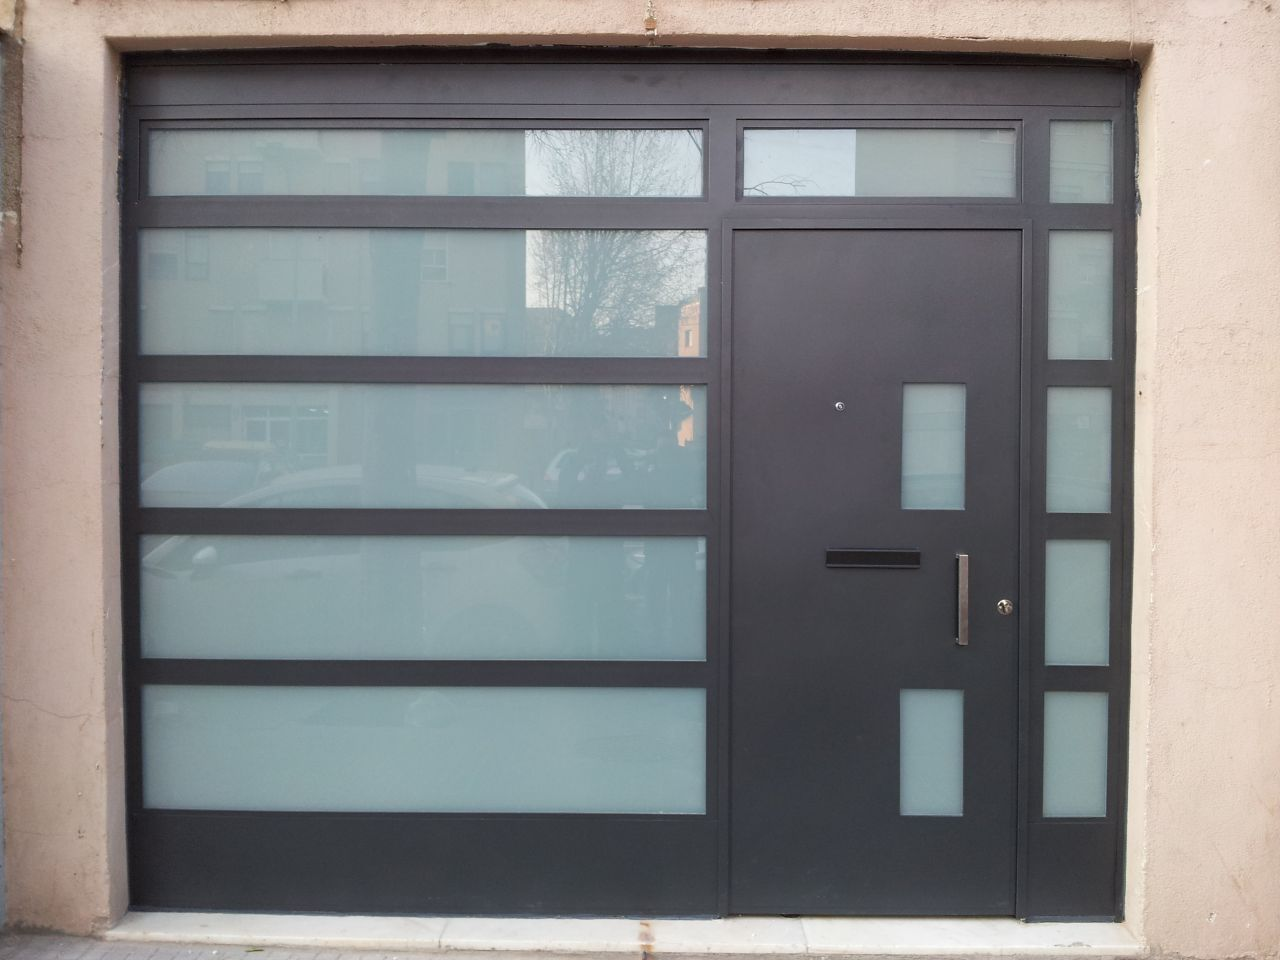 Puerta exterior | Loft | Pinterest | Imagenes de puertas, De puerta ...